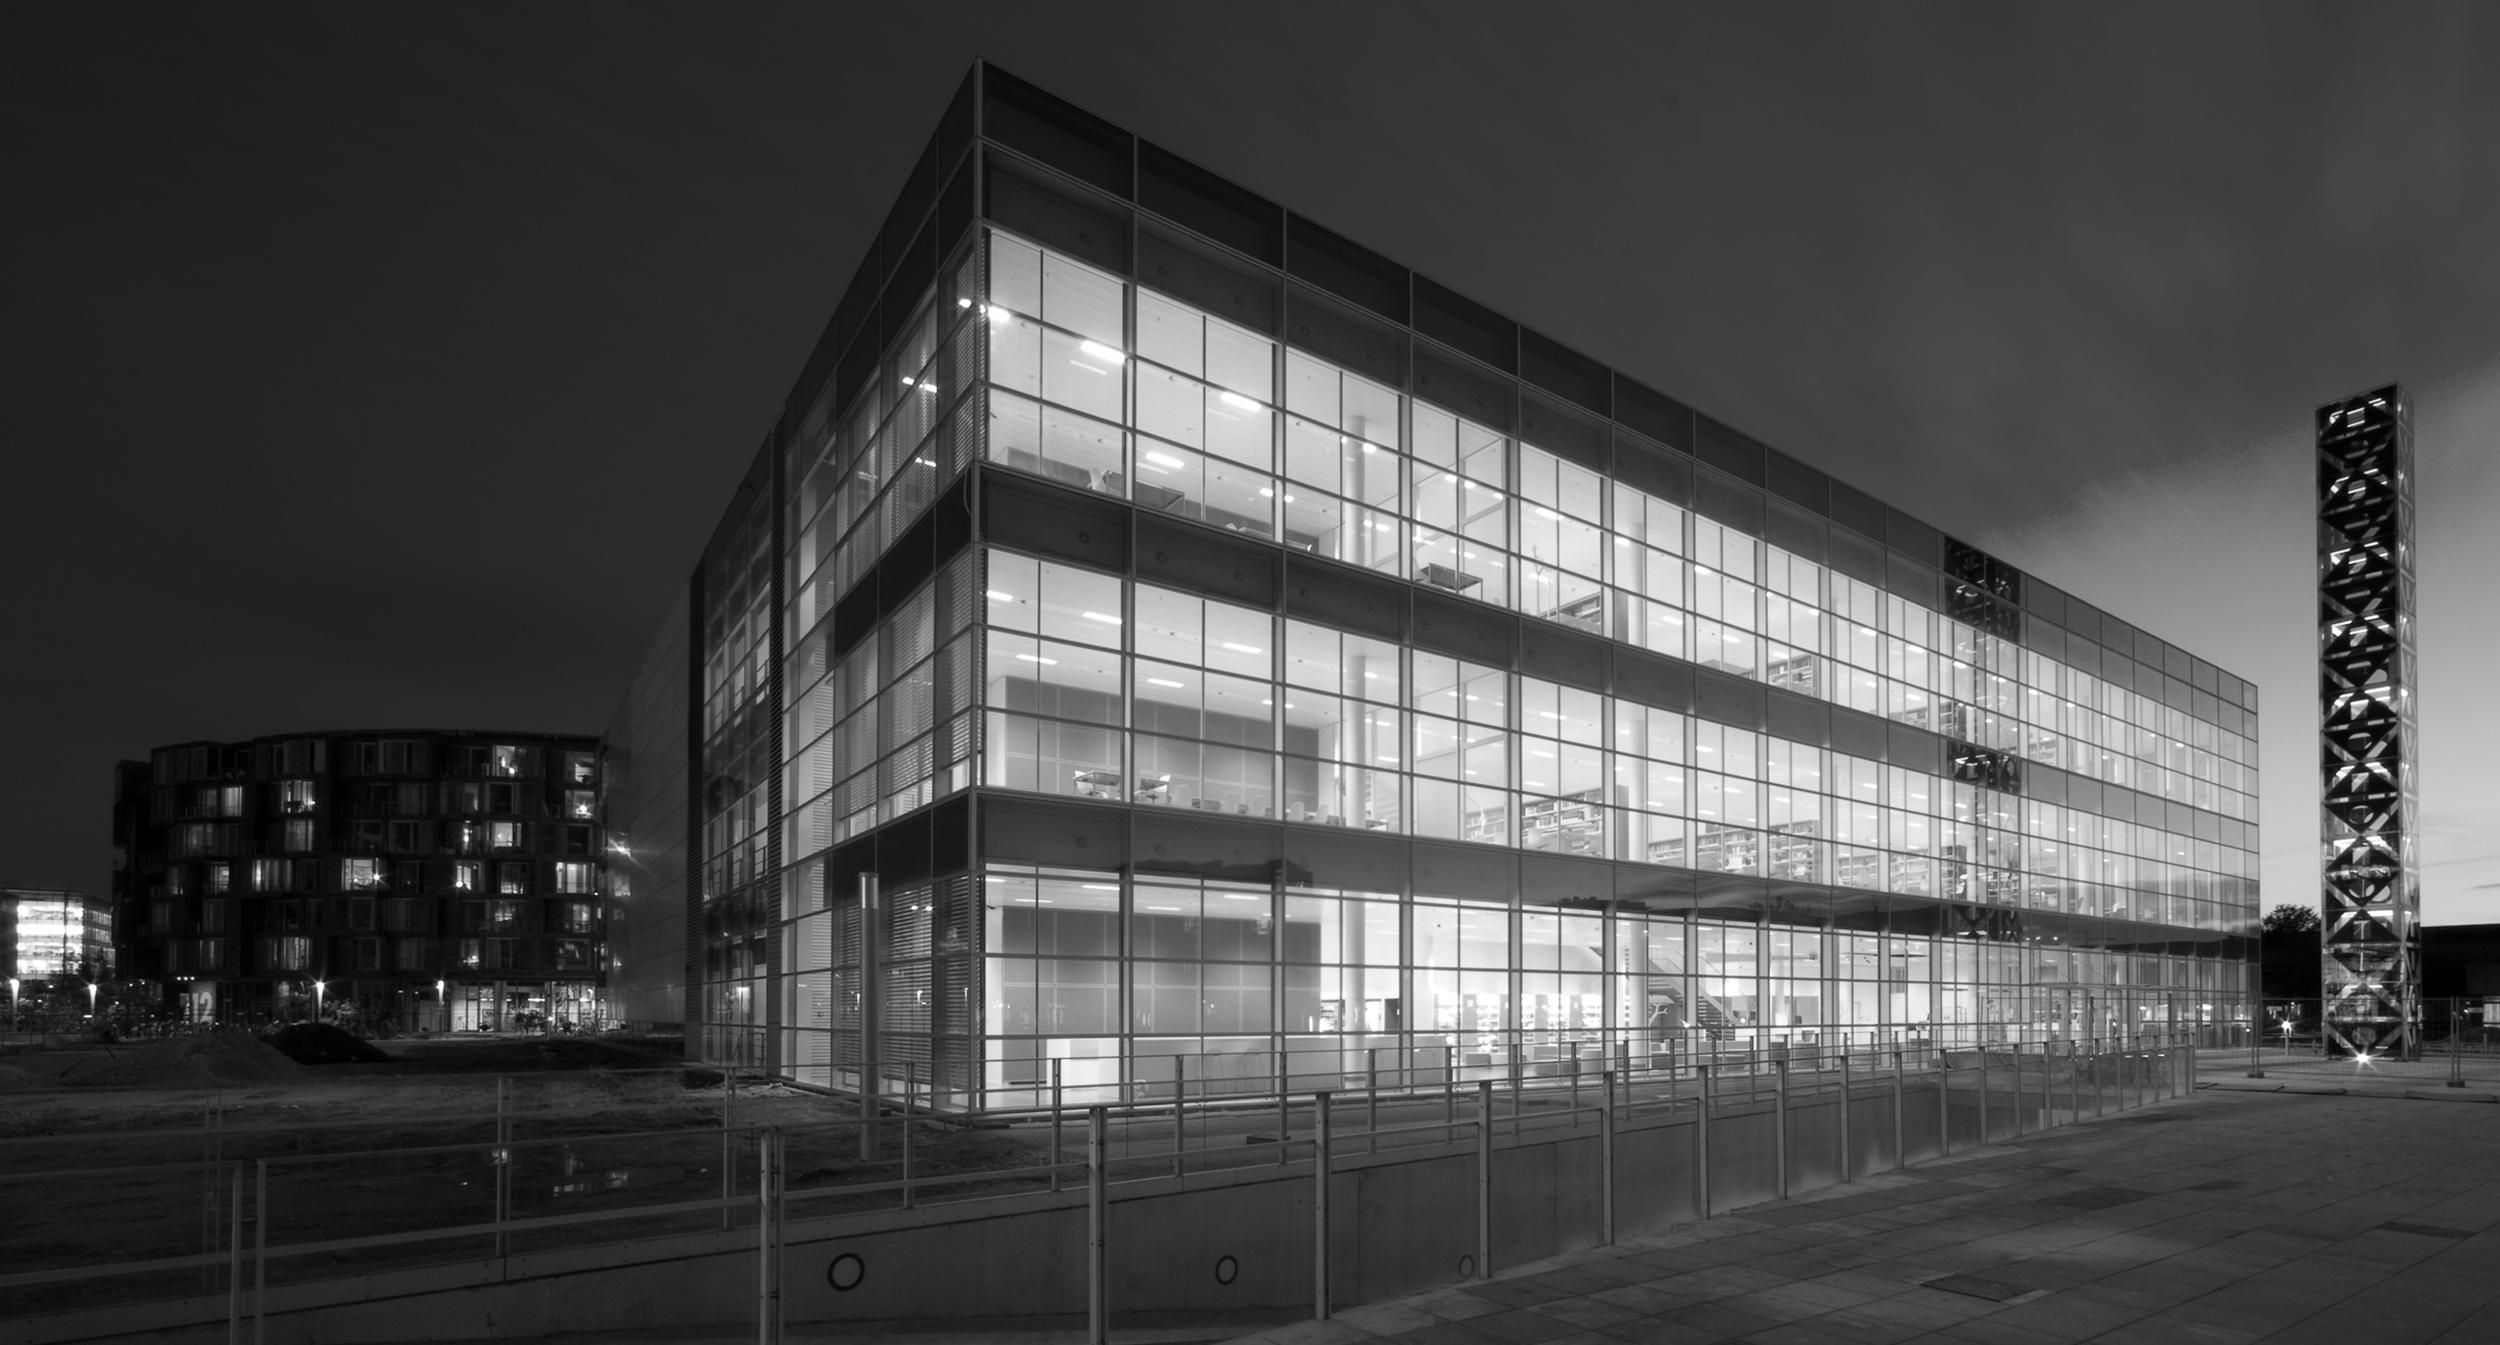 G-Mark, Good Design Award 2001   For Copenhagen University Library, South Campus.